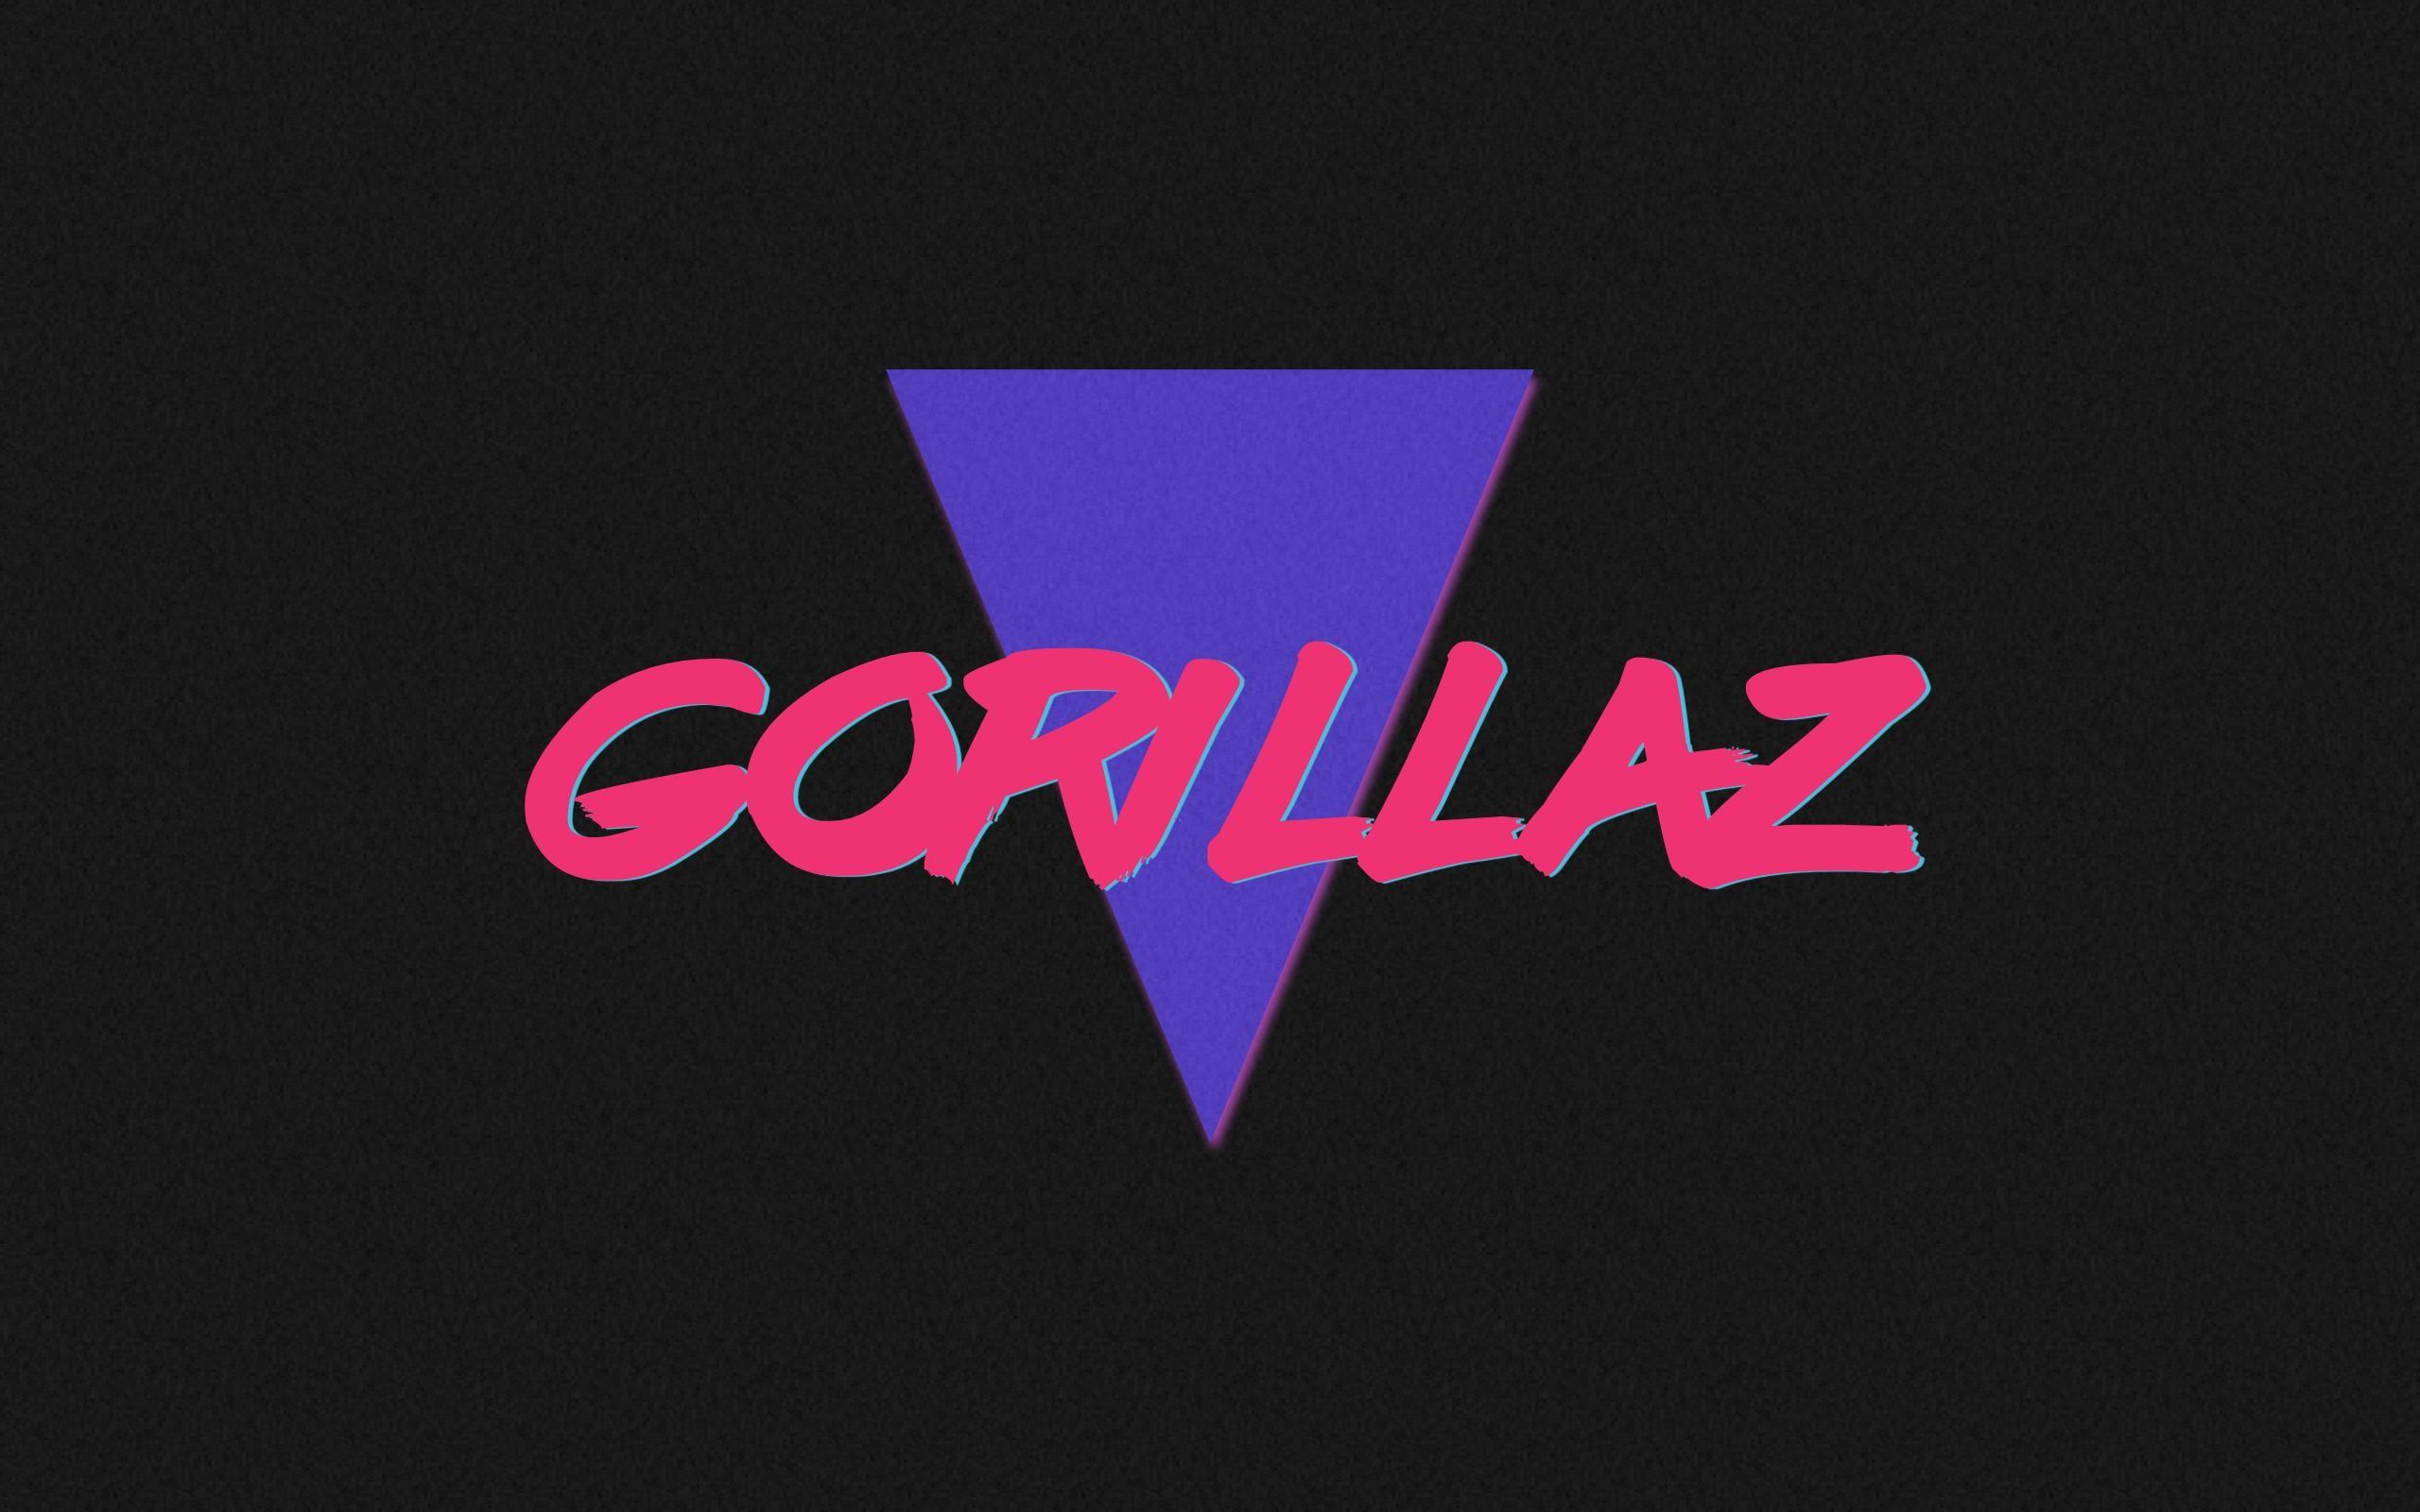 80's inspired Gorillaz wallpaper I made today.